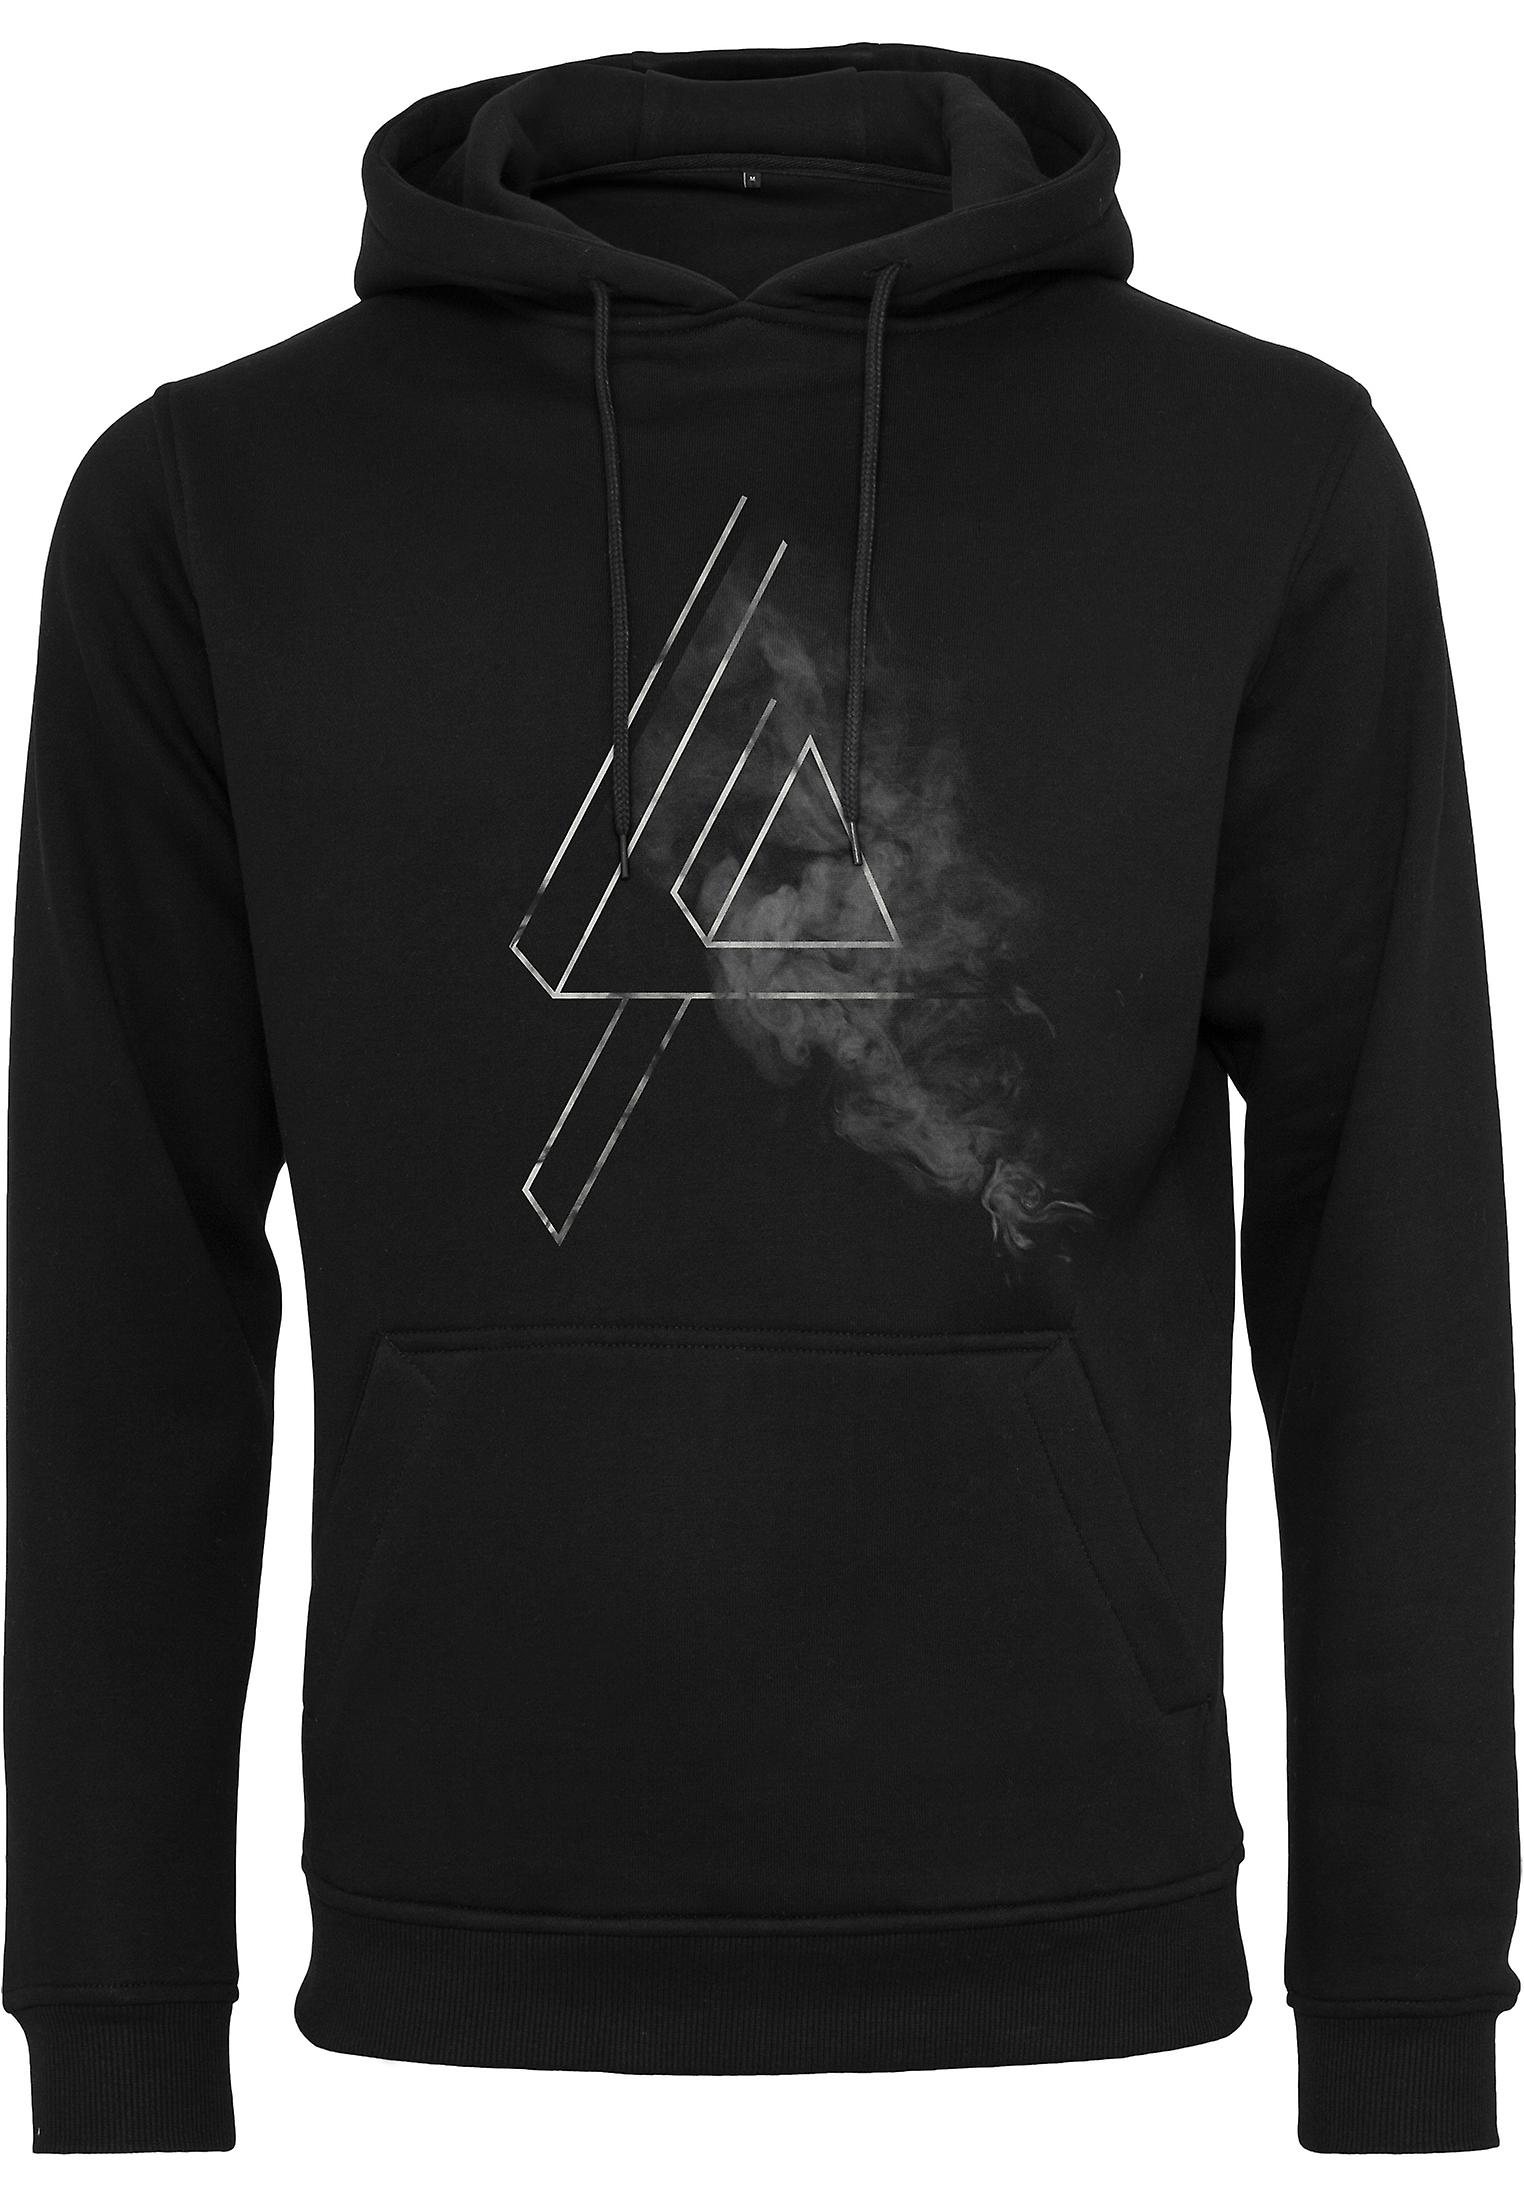 Linkin Park Extreme Cold Weather Parka Jacket UK Promo ... |Linkin Park Vest